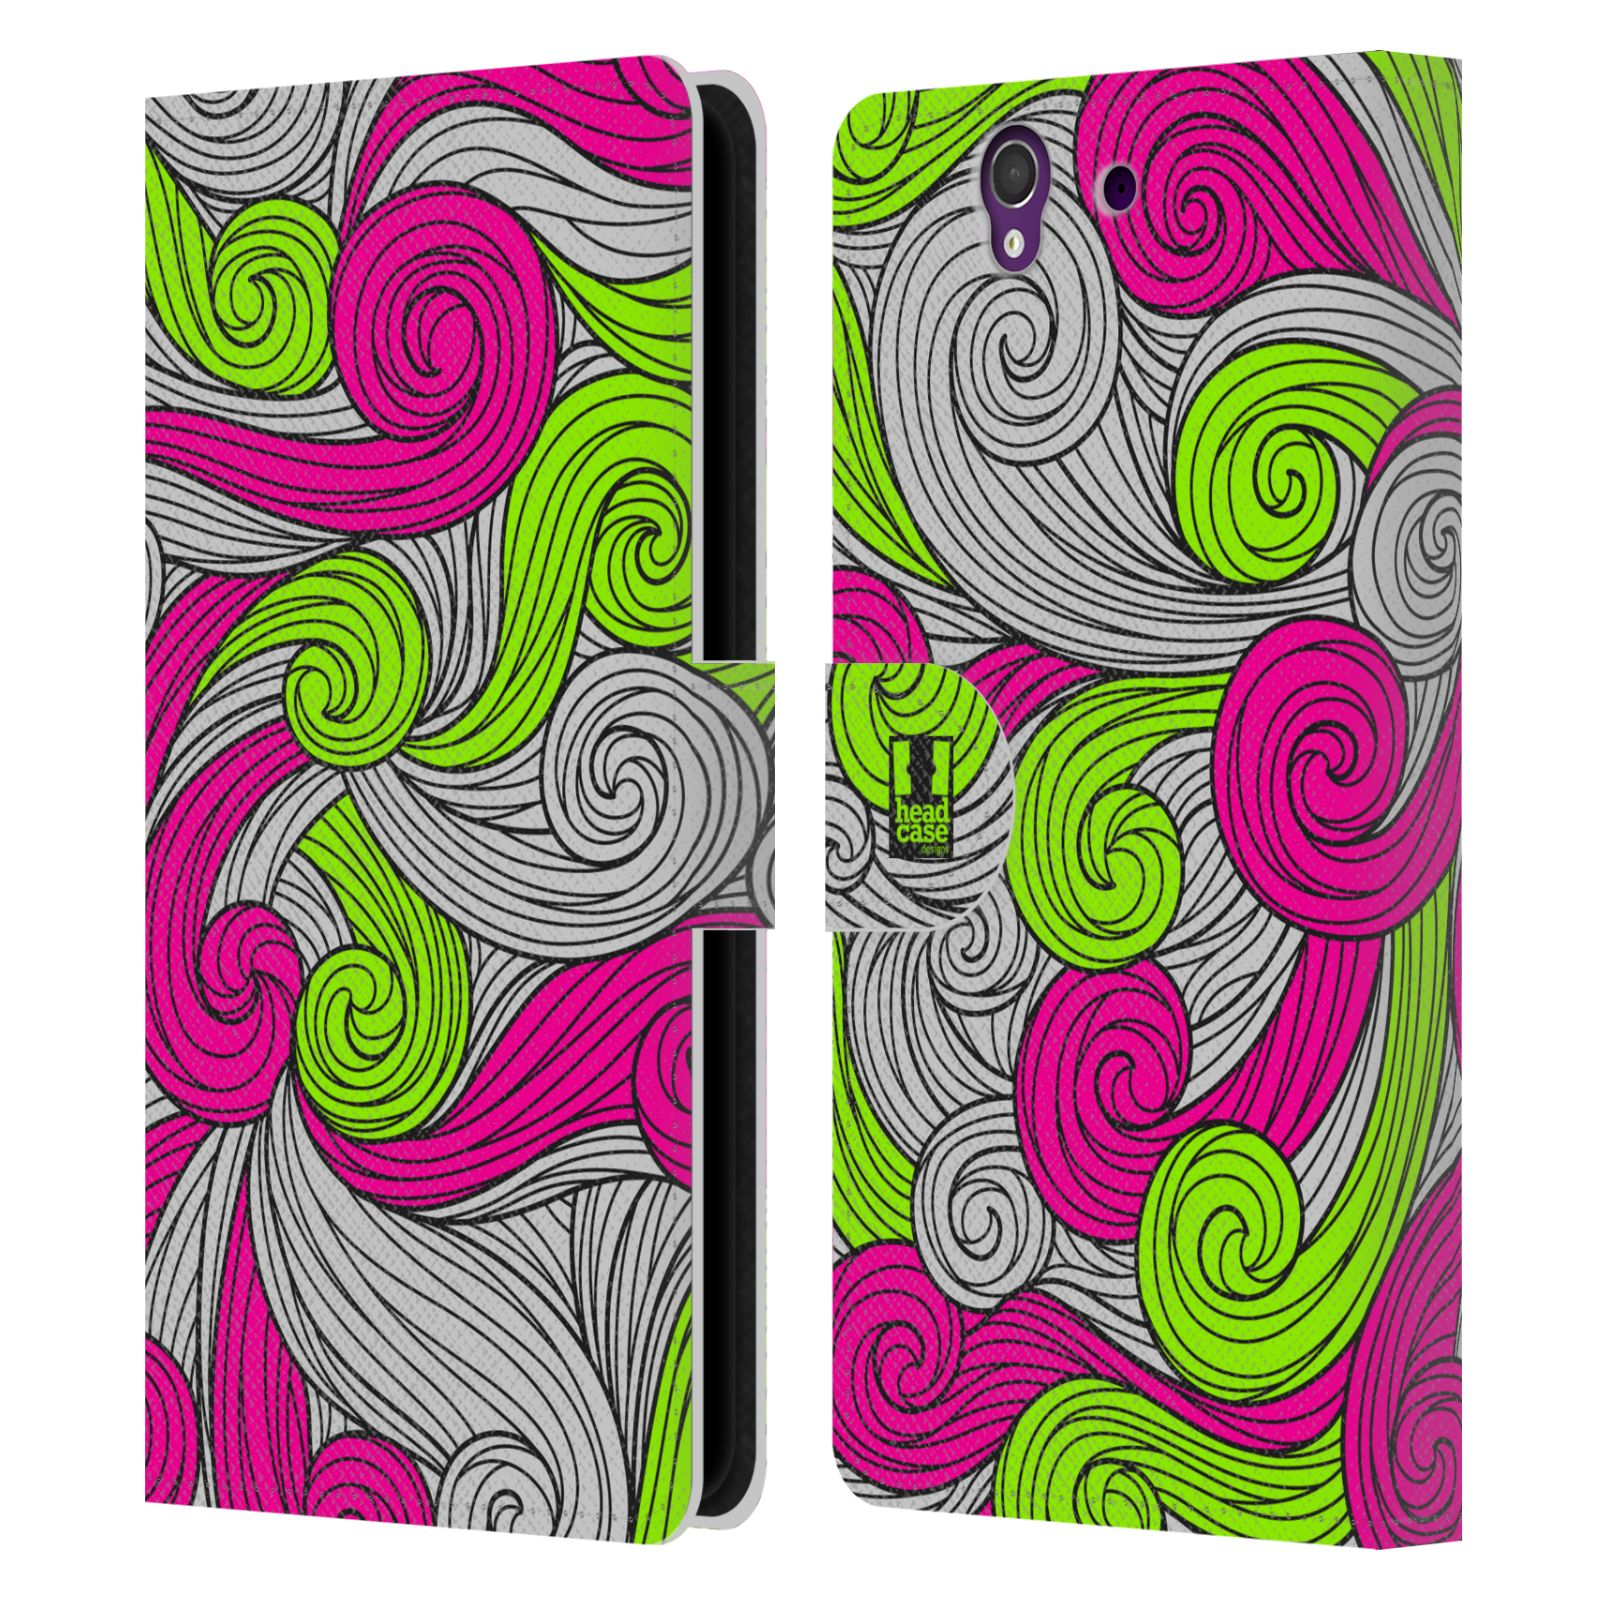 HEAD CASE Flipové pouzdro pro mobil SONY XPERIA Z (C6603) barevné vlny zářivě růžová a zelená